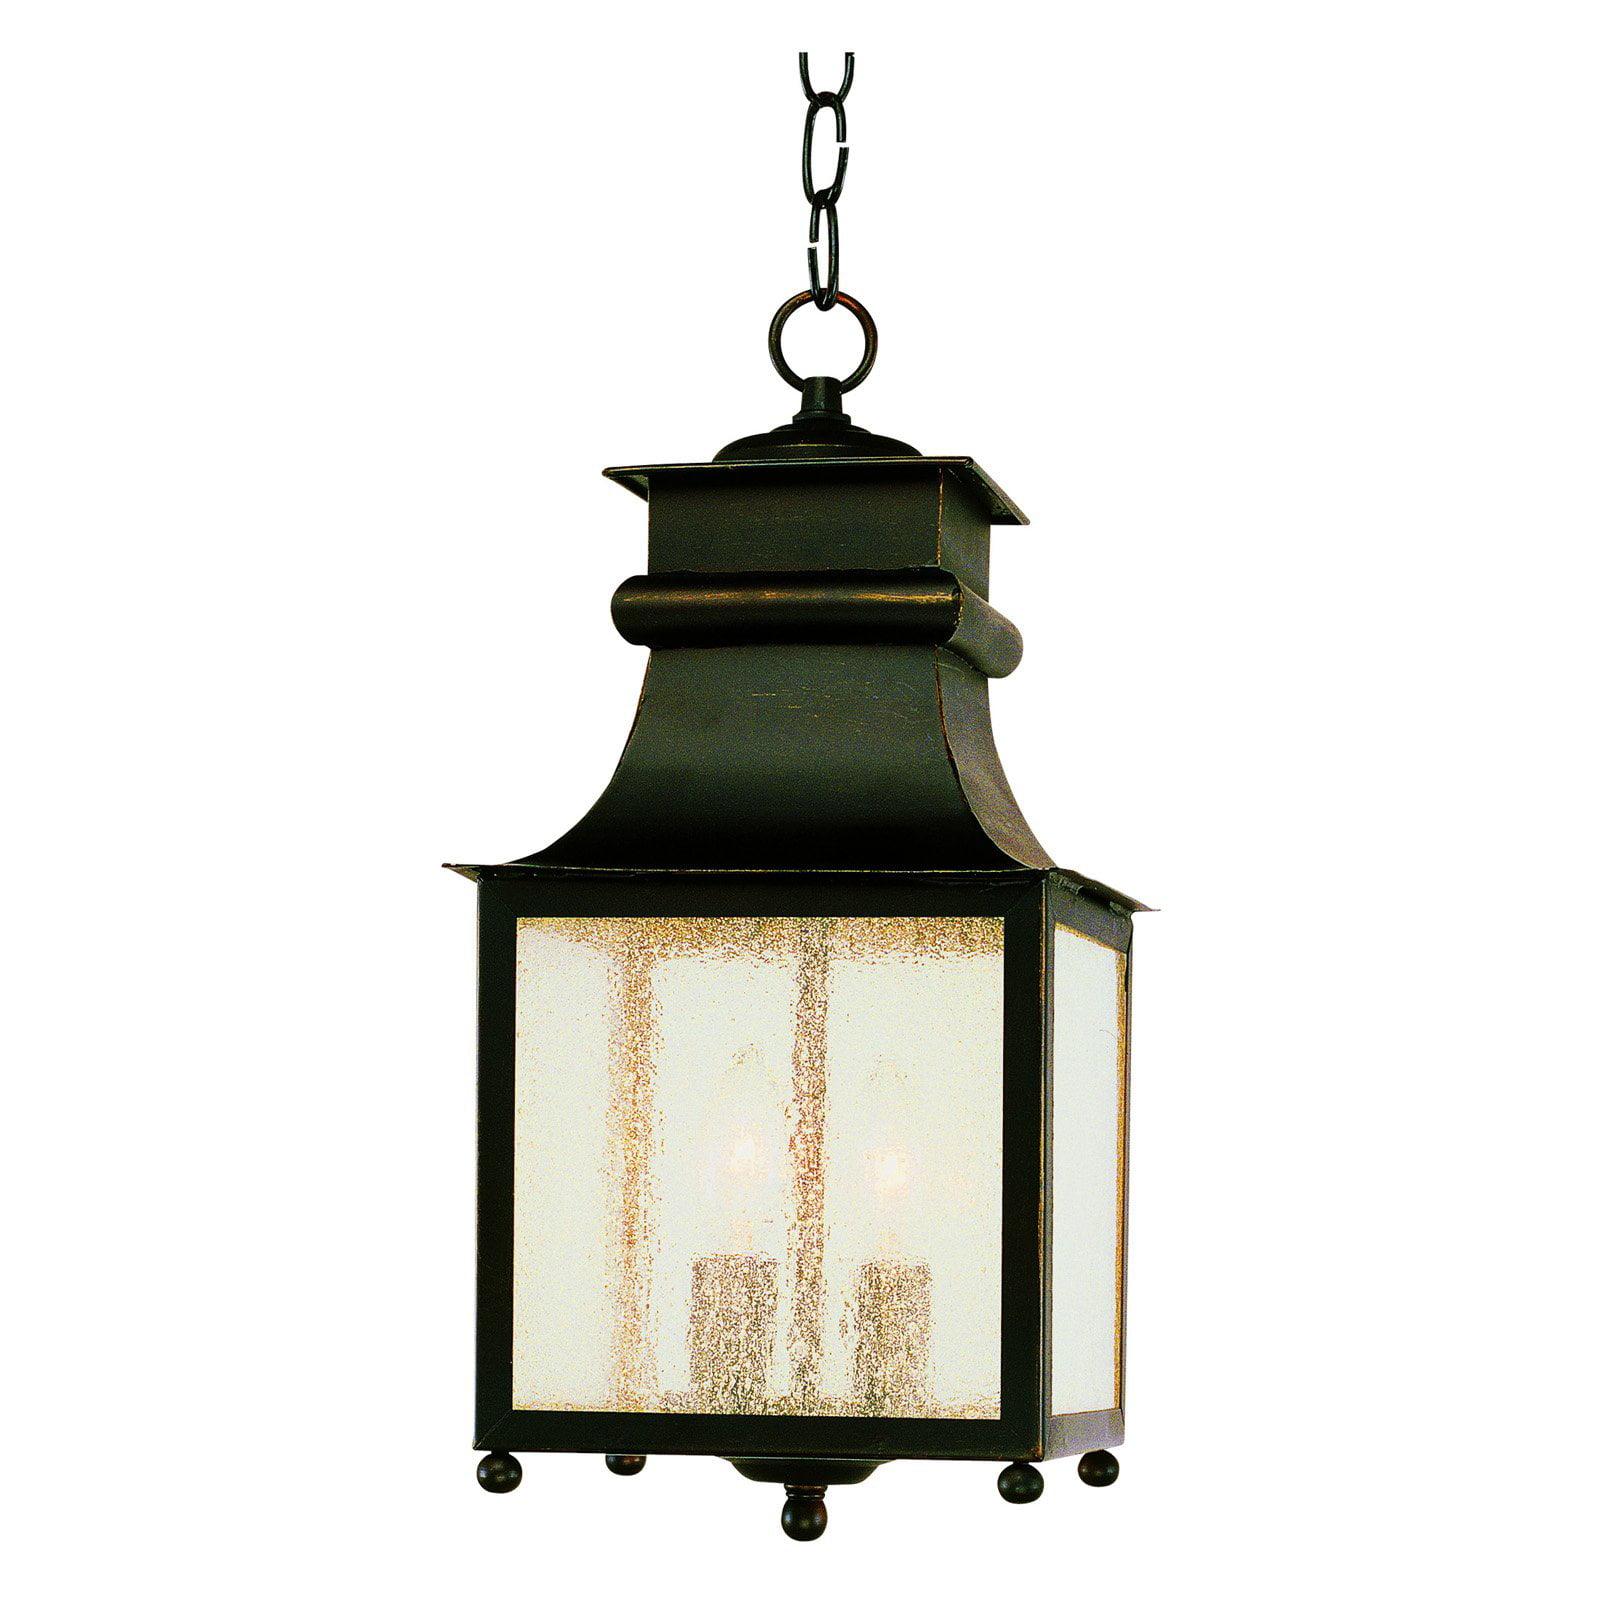 Trans Globe 45633 WB Hanging Lantern Weather Bronze 8W in. by Trans Globe Lighting